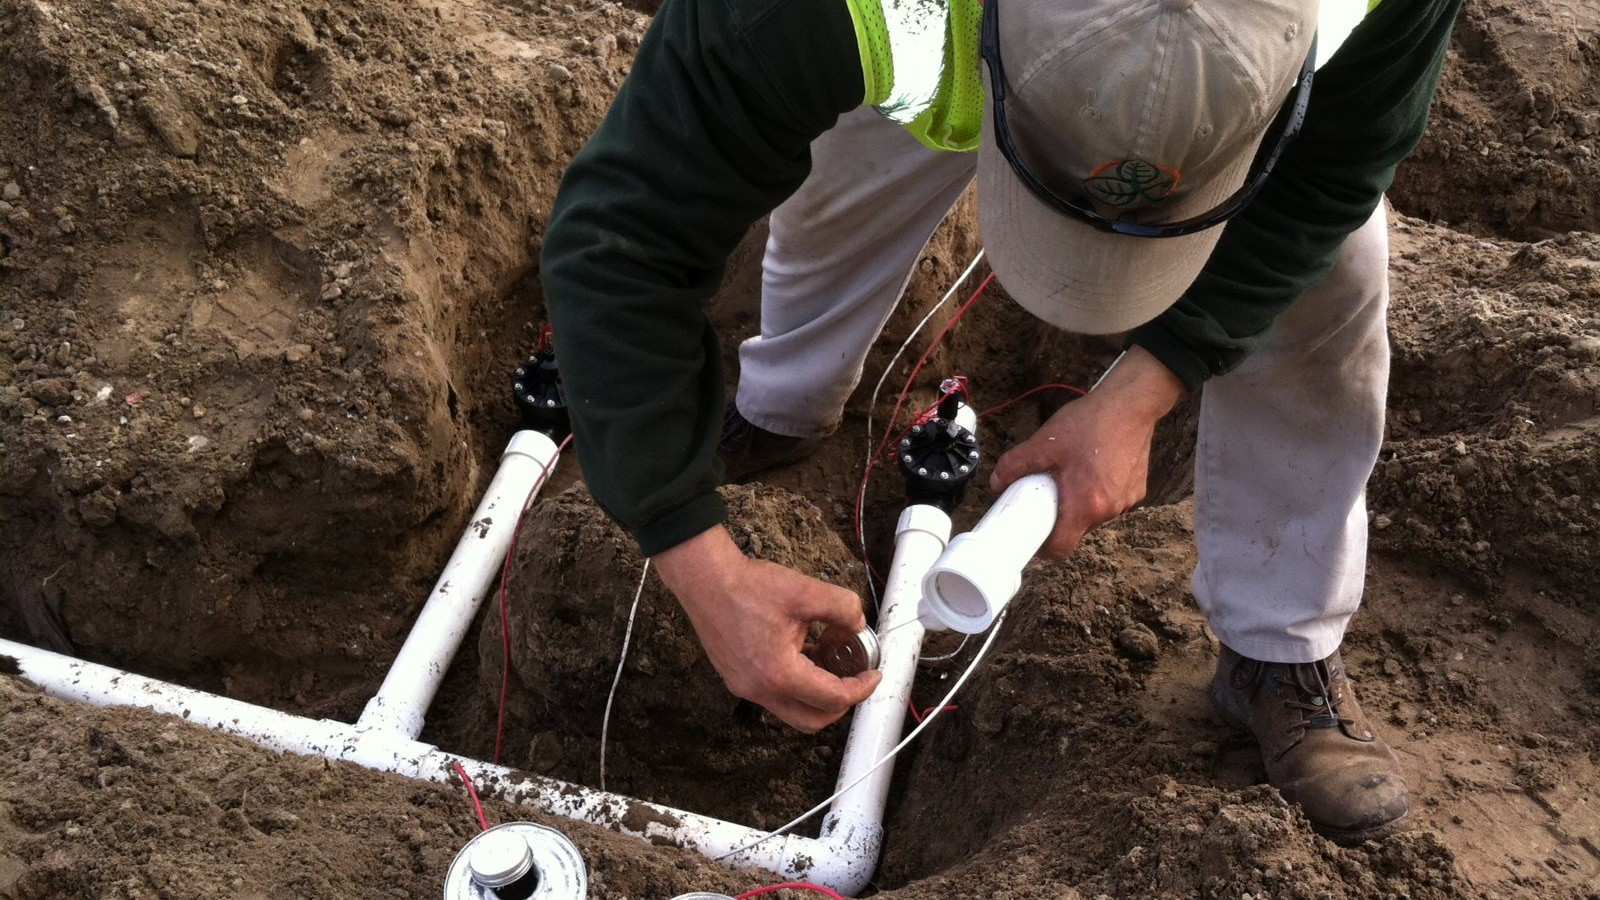 Irrigation-Pipe-Services-South-Carolina